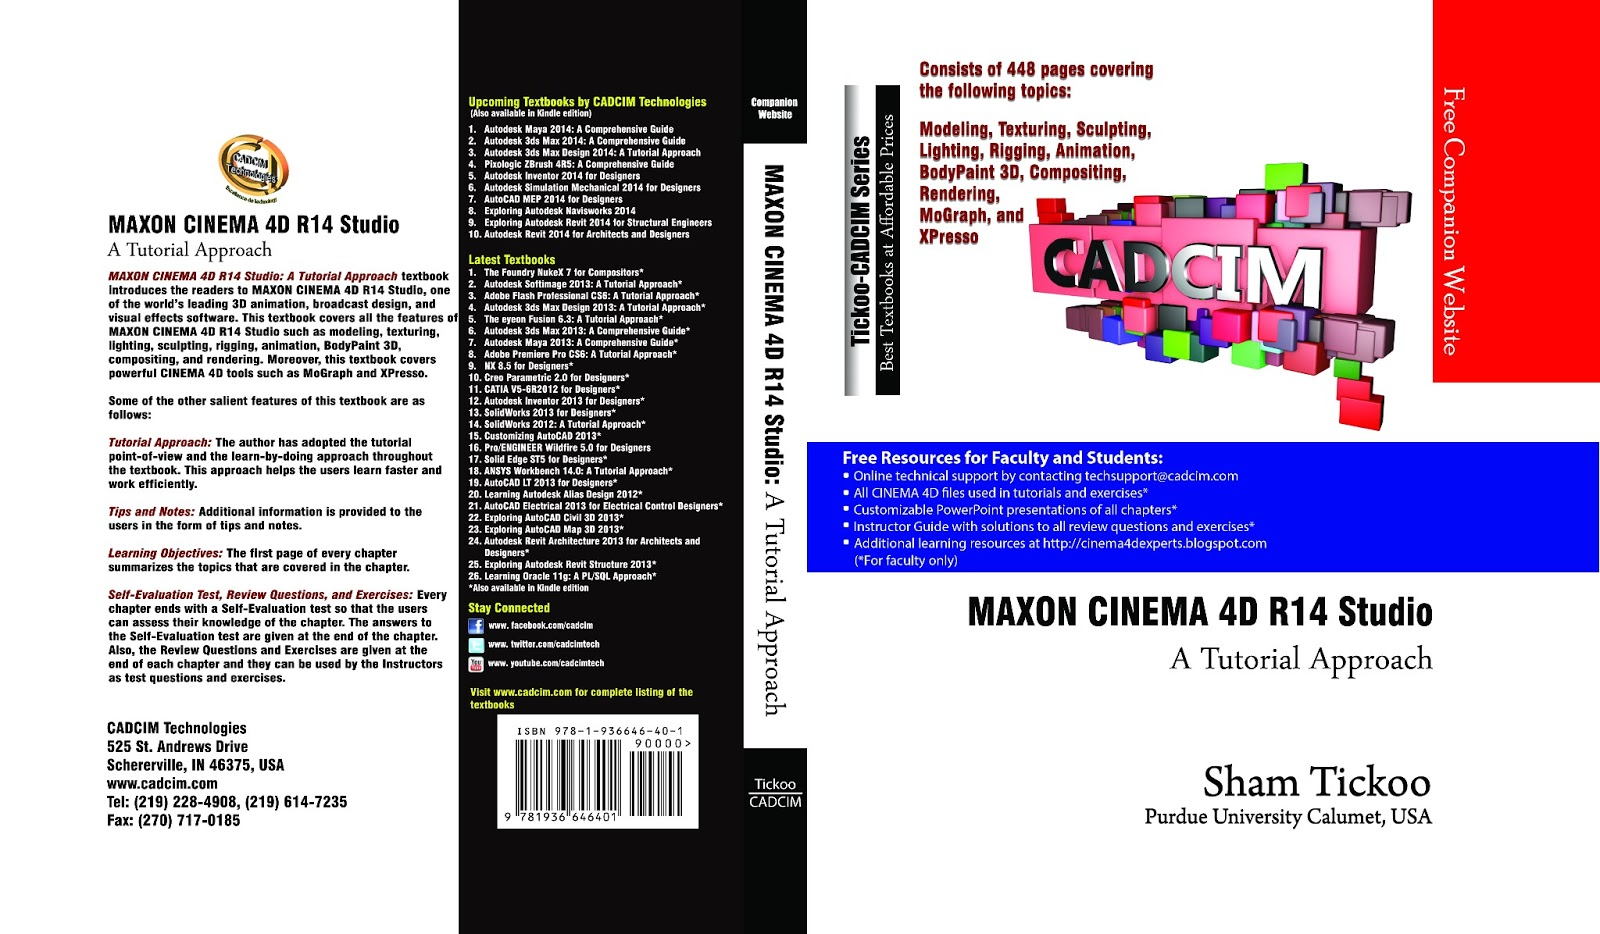 maxon cinema 4d r14 studio a tutorial approach cinema. Black Bedroom Furniture Sets. Home Design Ideas